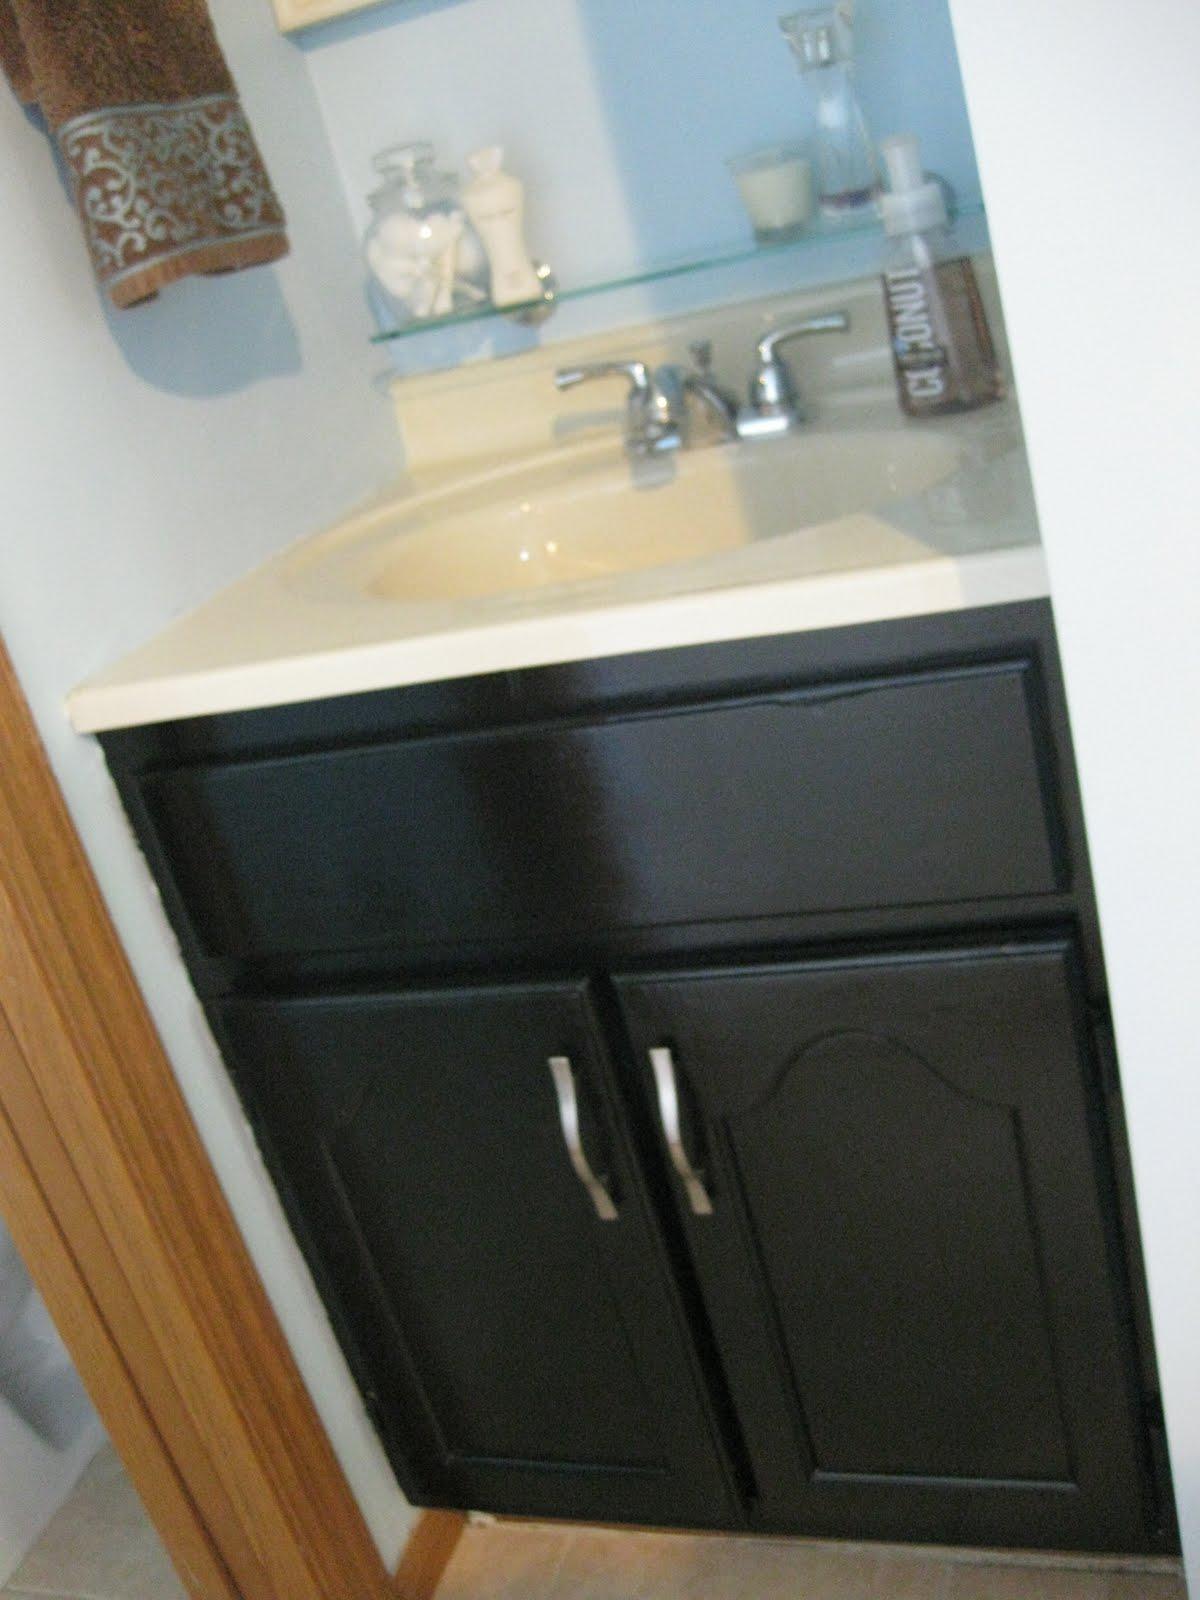 We also put up an ultra sleek looking glass shelf above our faucet: